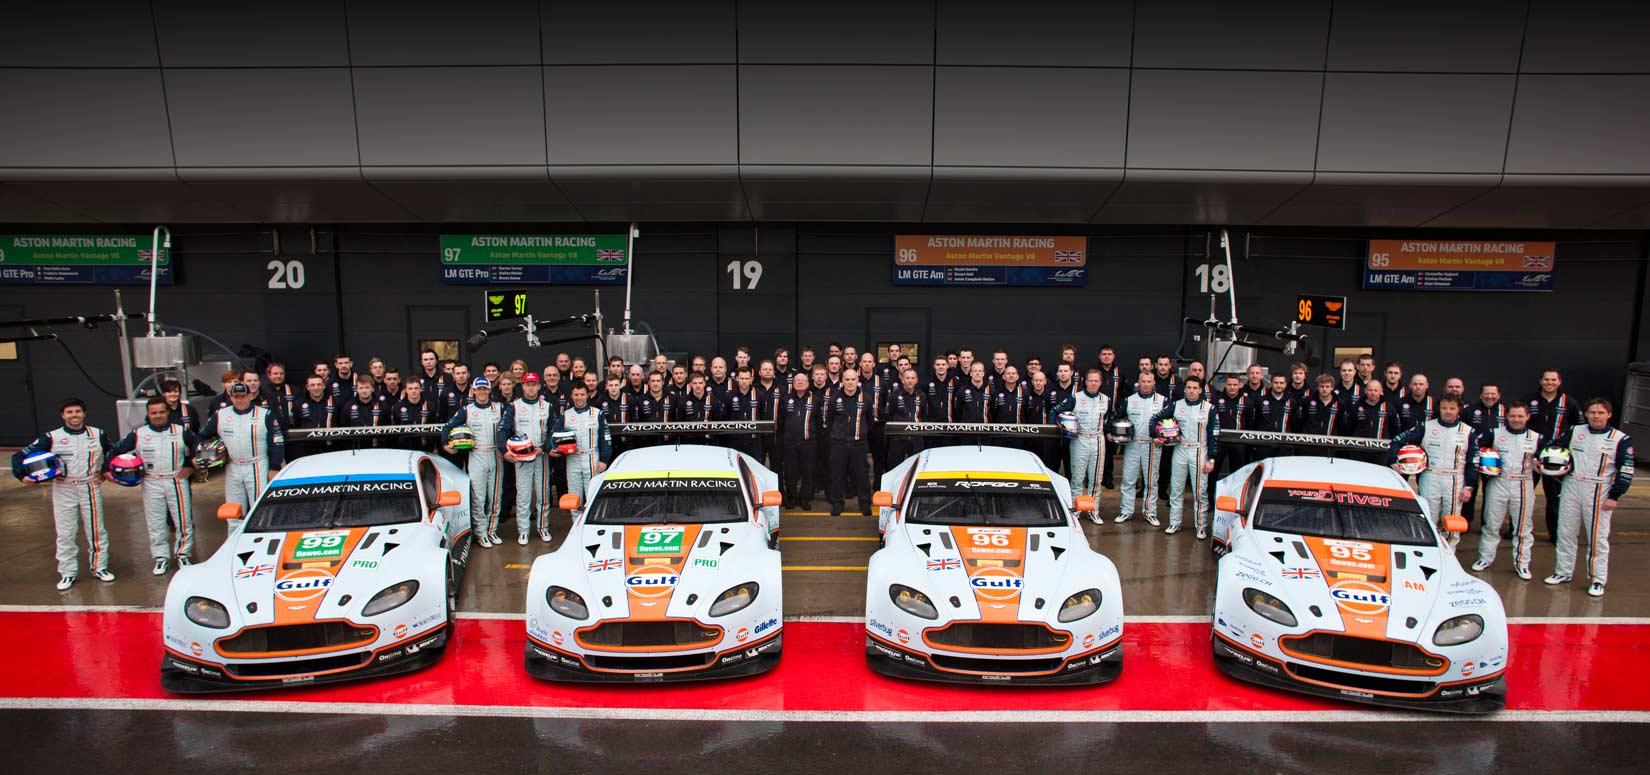 Aston Martin Racing - Silverstone